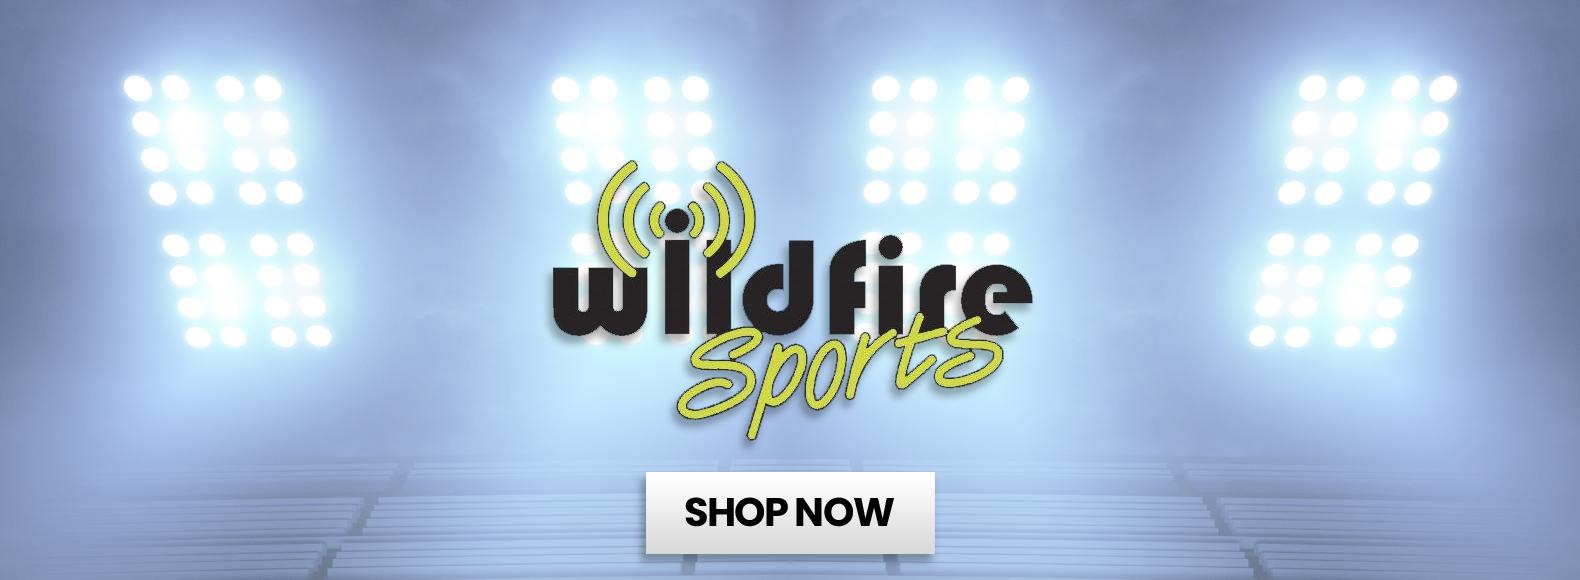 Wildfire Sports.jpg